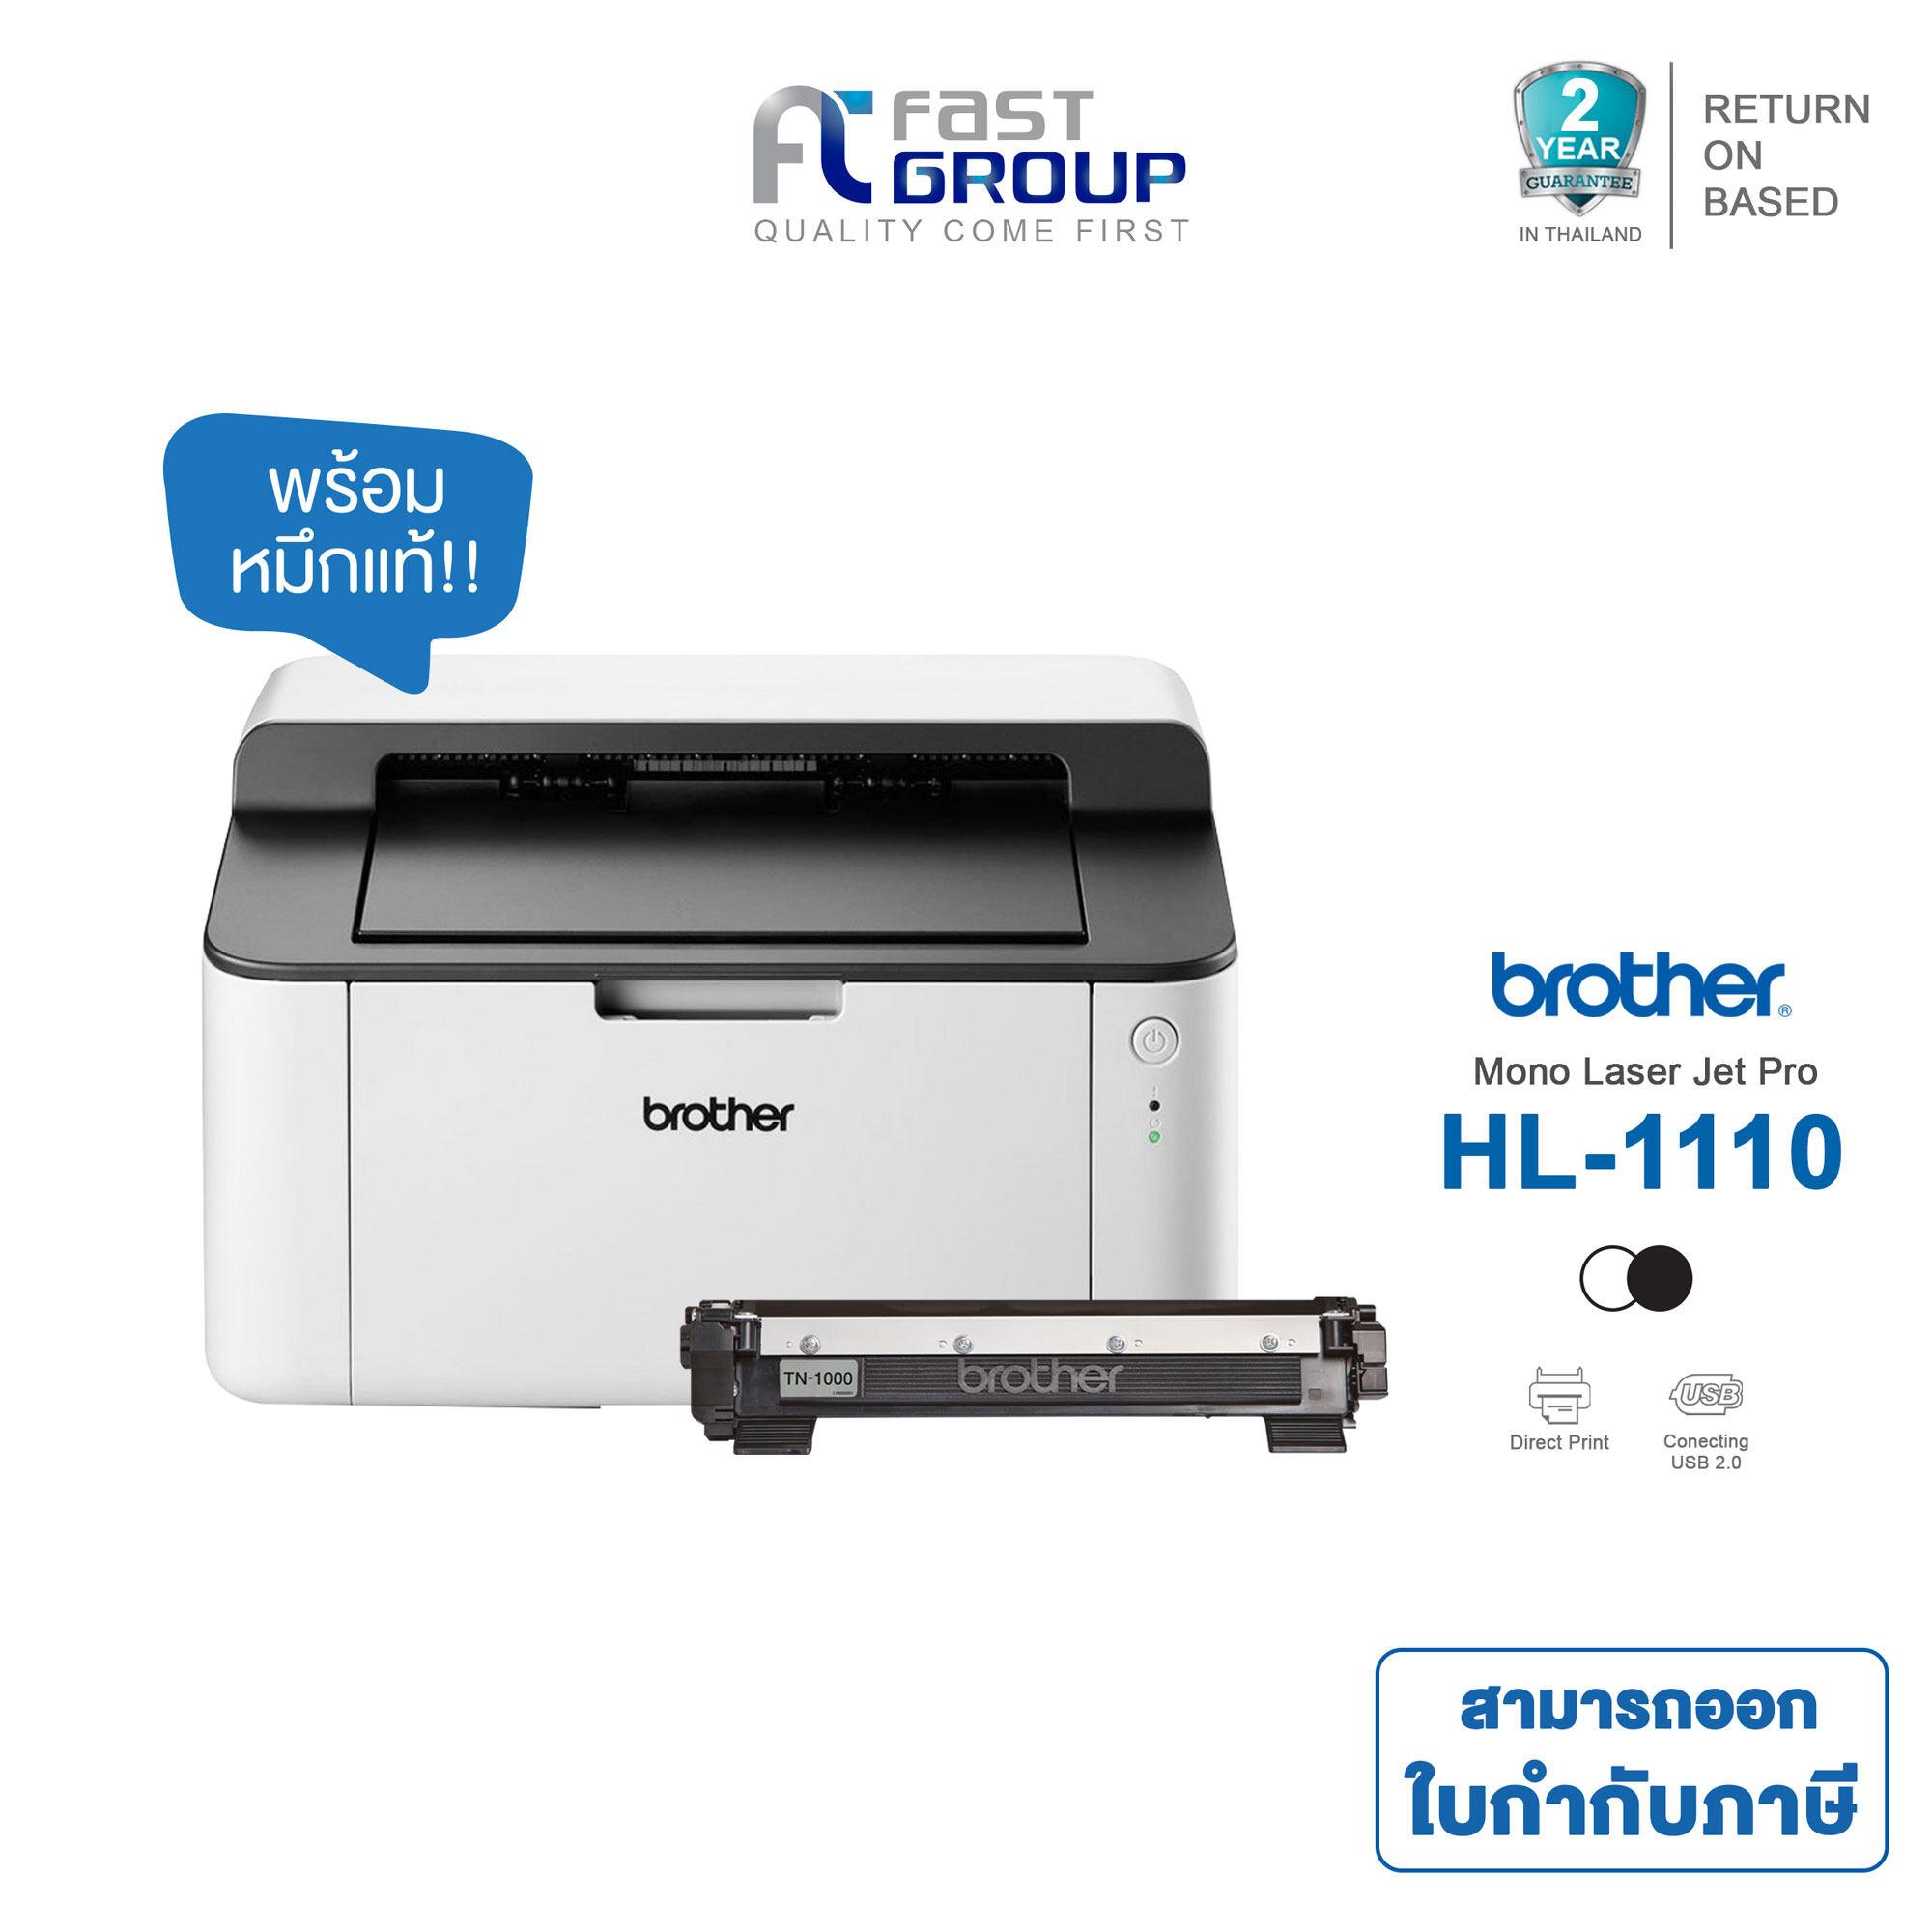 Brother Printer Laser เครื่องปริ้นเตอร์ รุ่น HL-1110 เลเซอร์แบบ LED